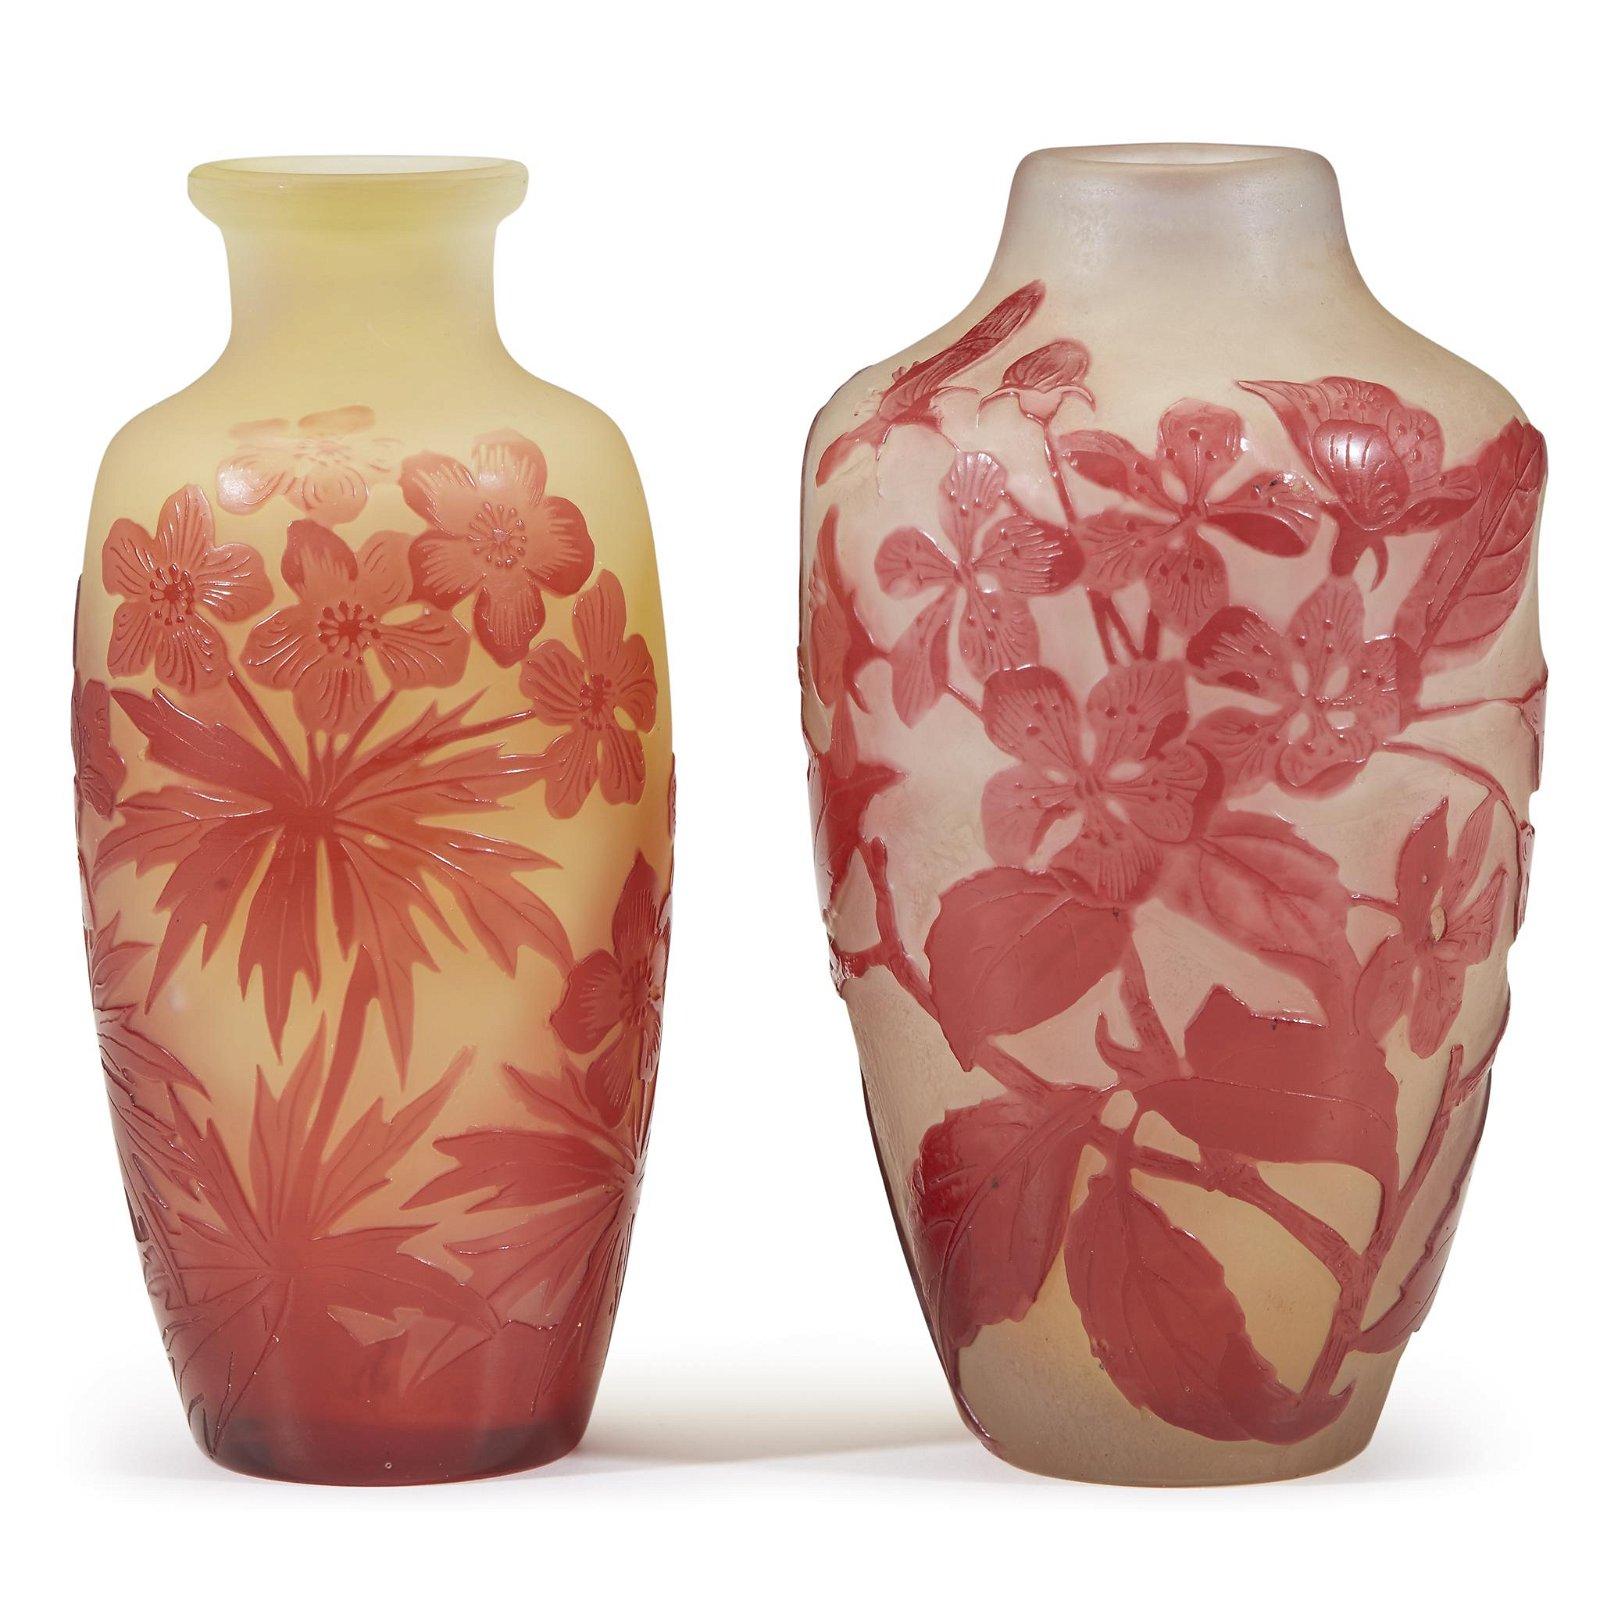 Émile Gallé (French, 1846-1904), Two Floral Vases,